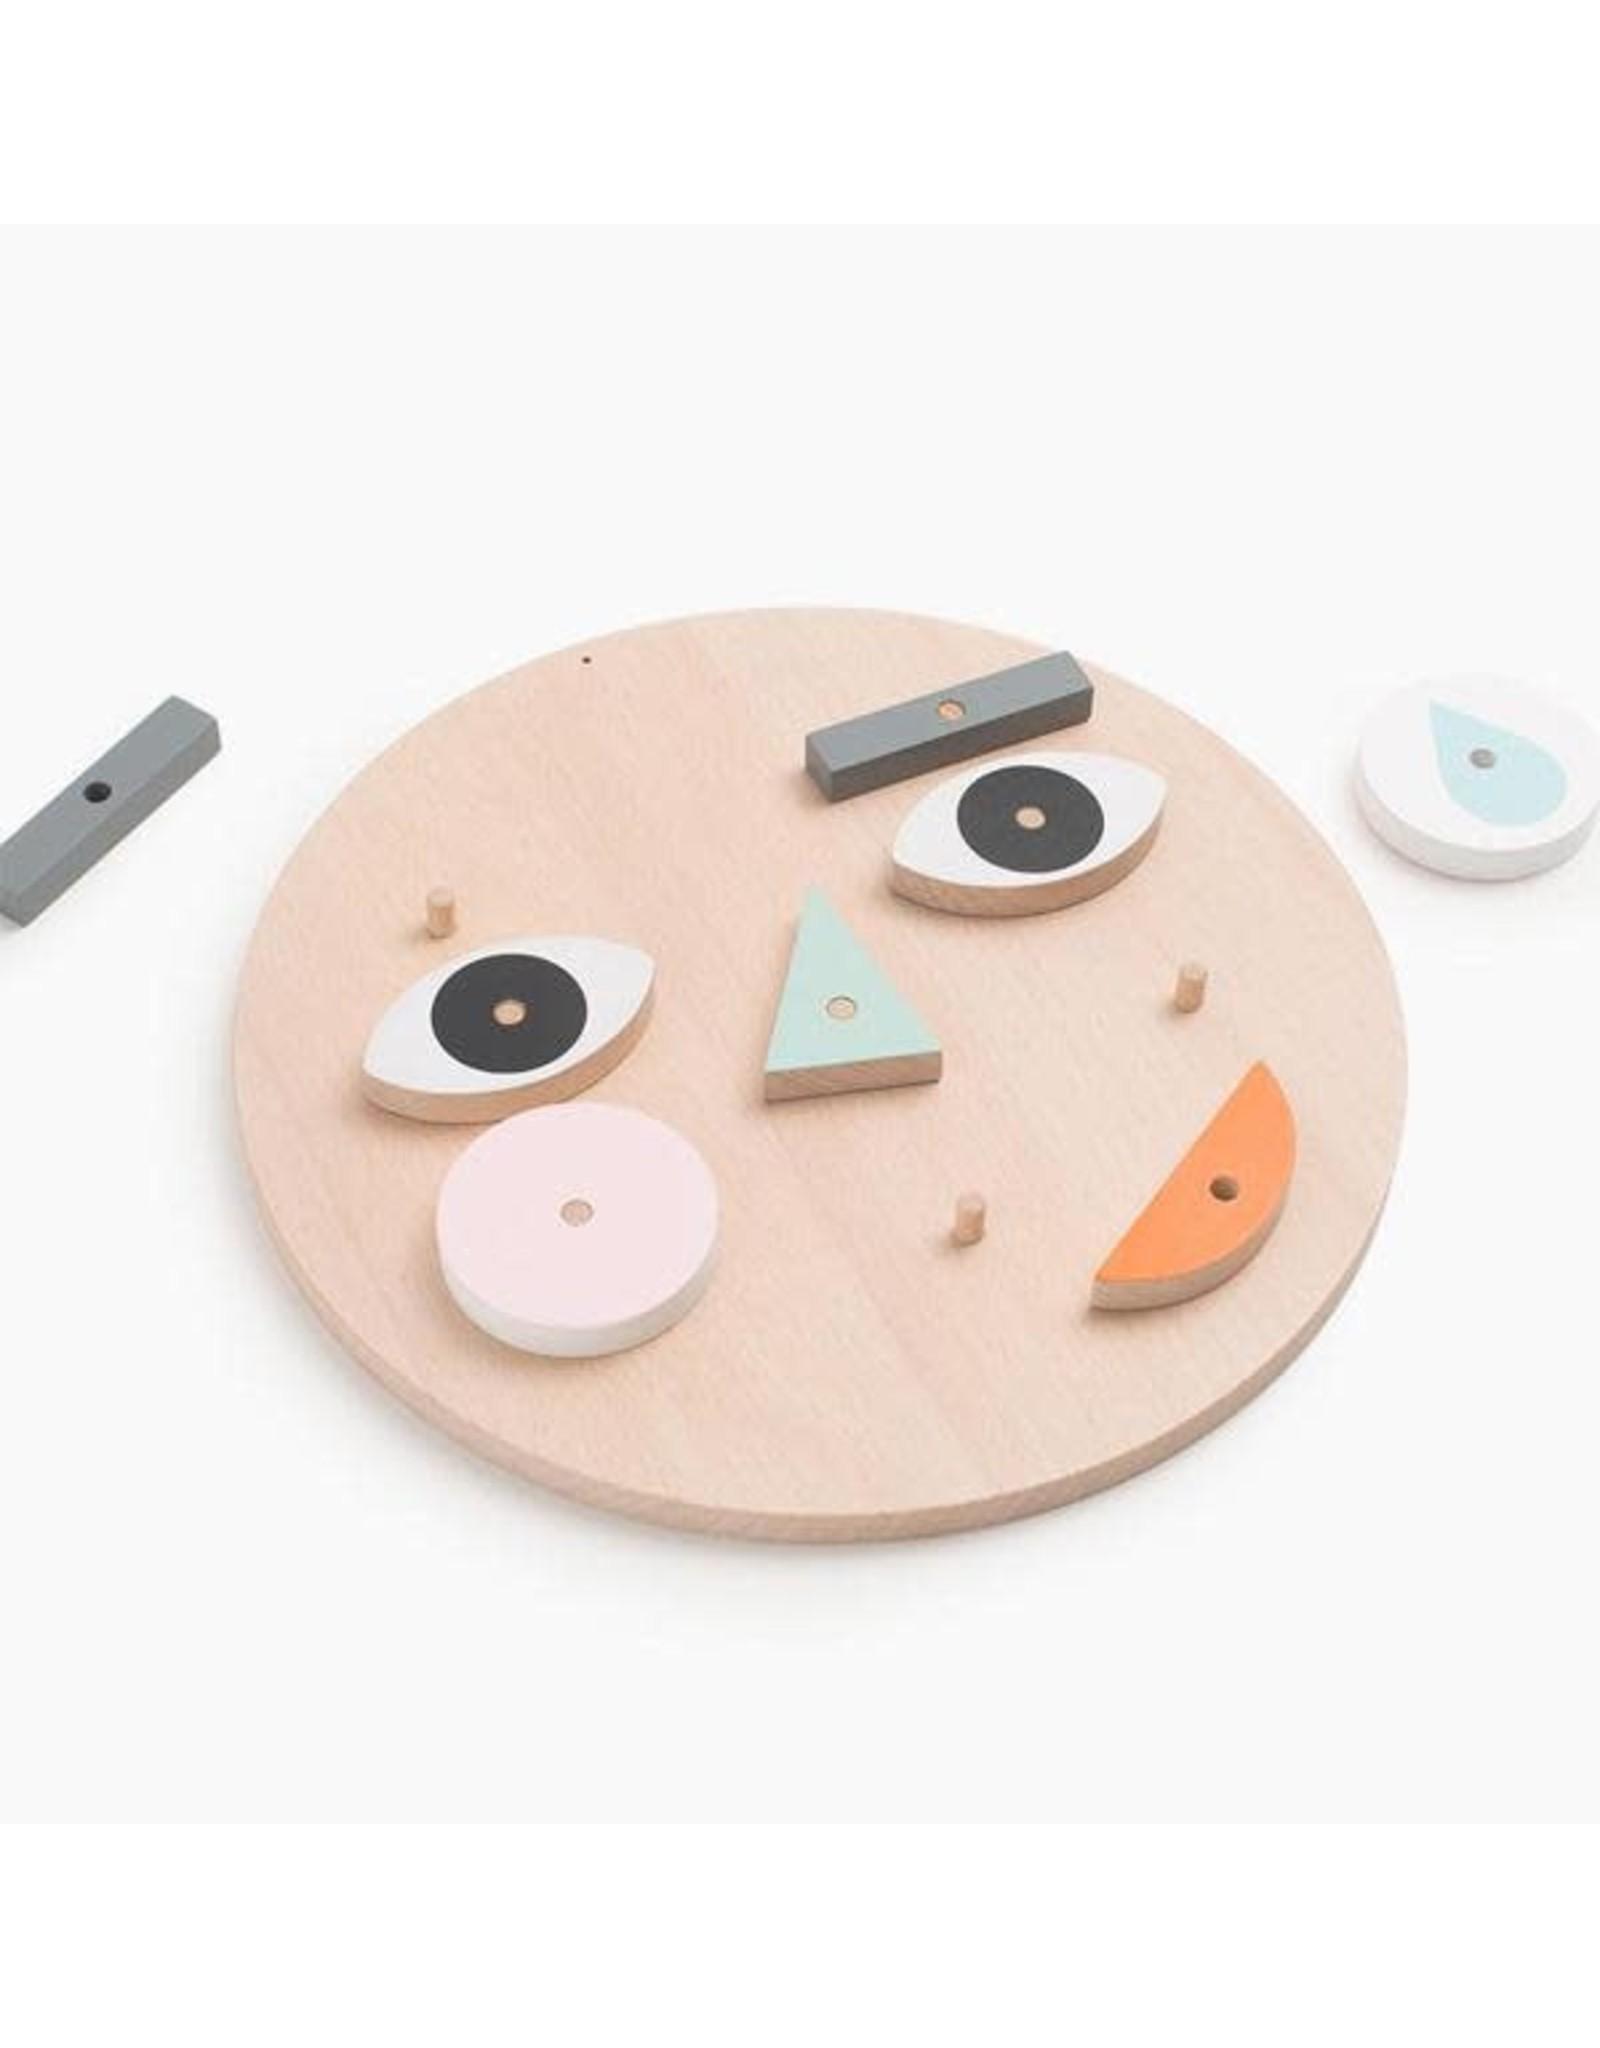 Moon Picnic Make a Face Toy